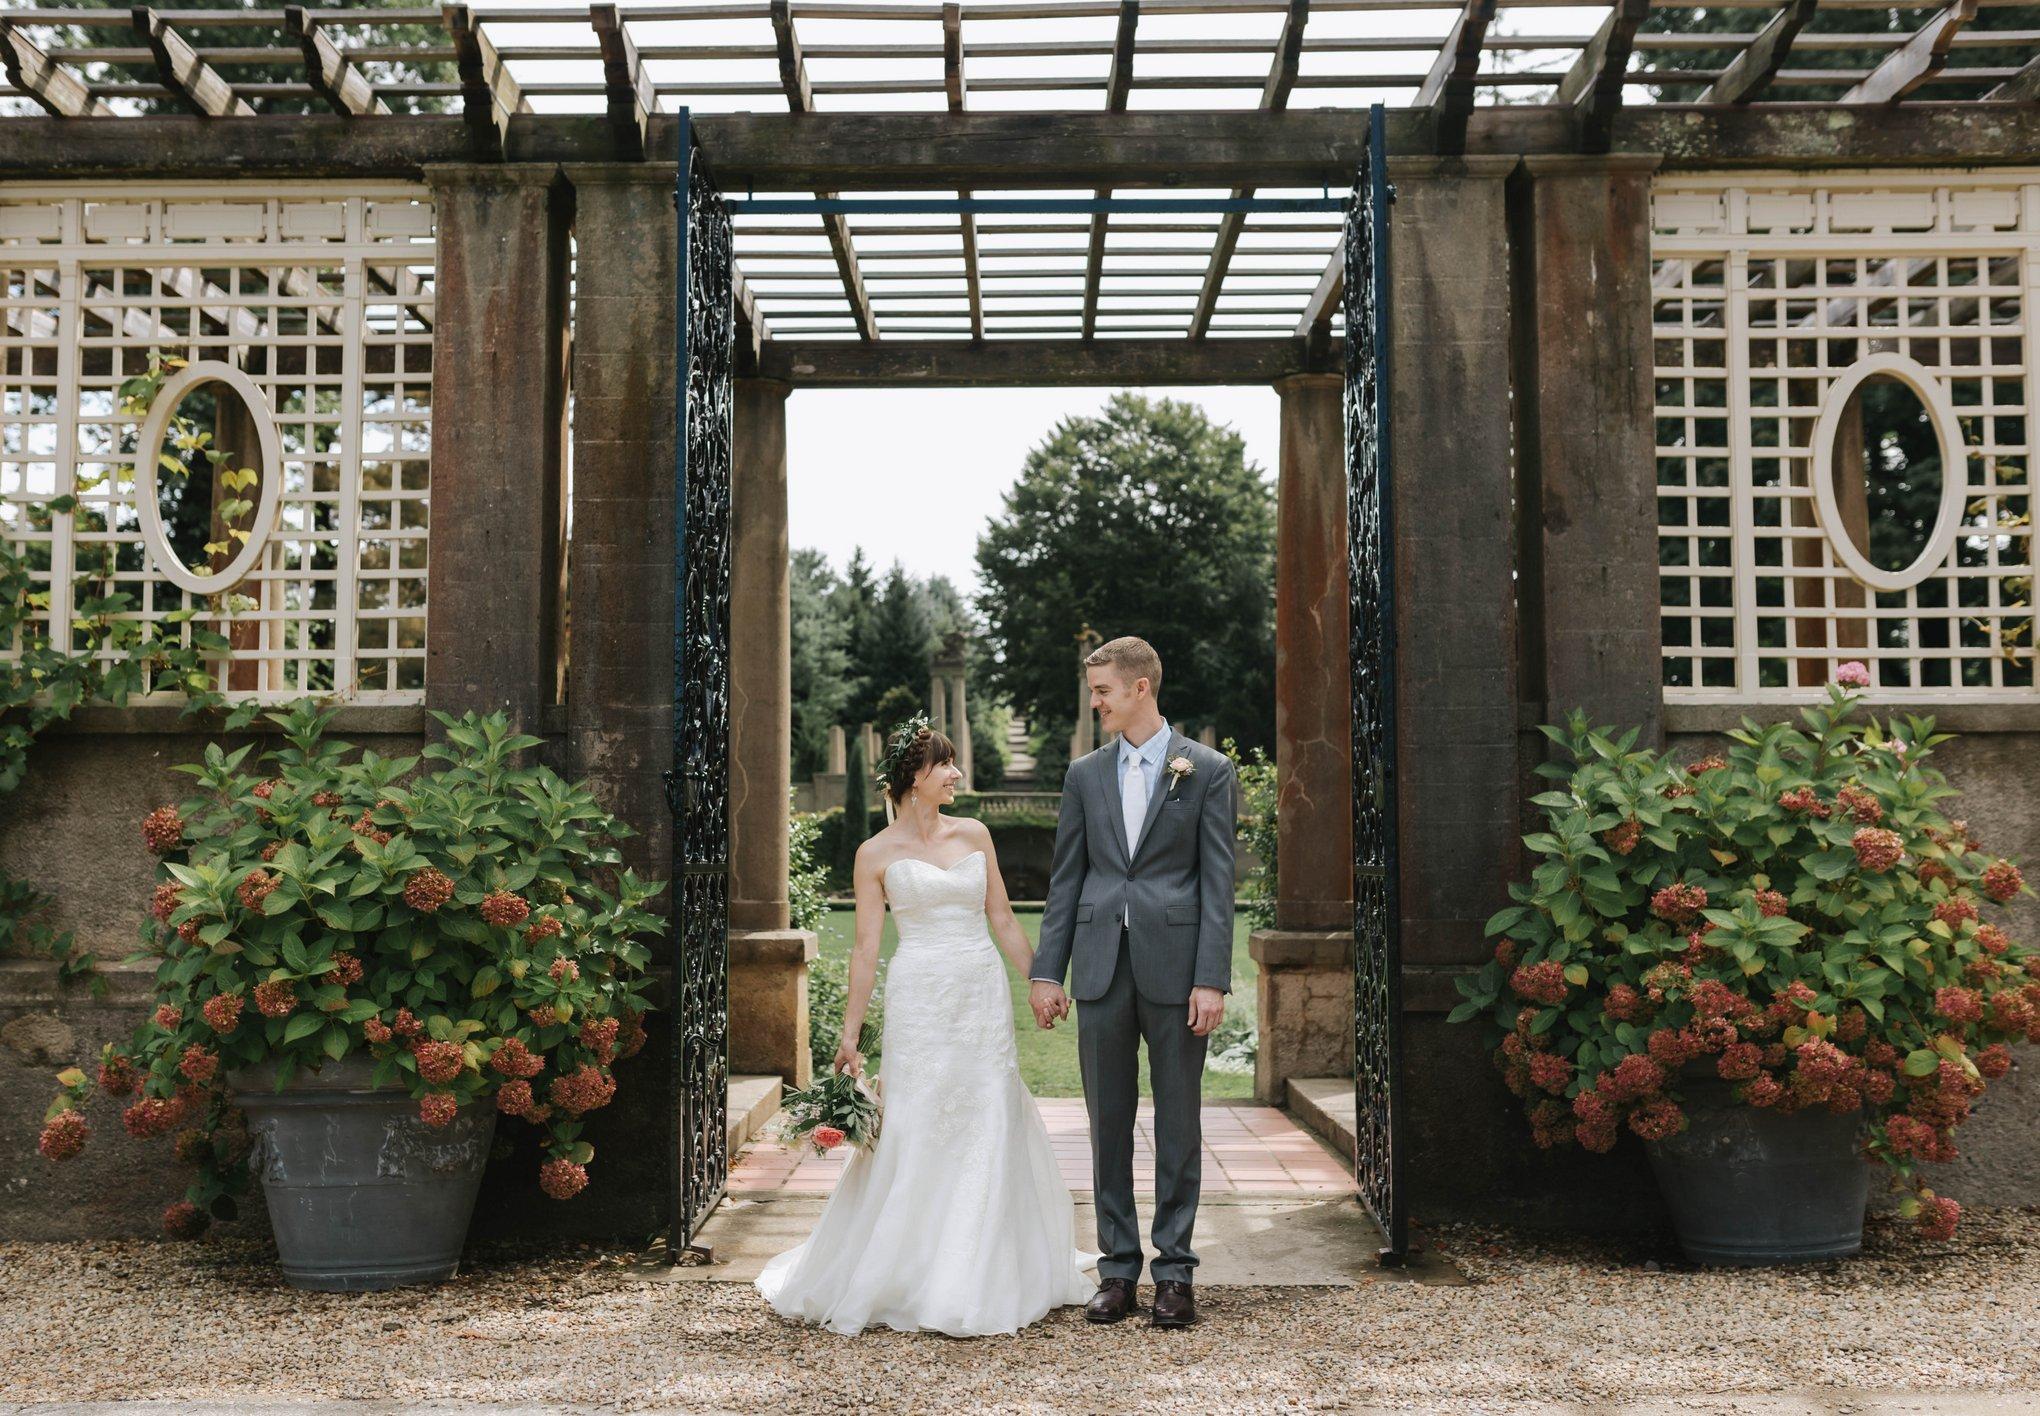 Crane-Estate-Vow-Renewal-Wedding-13.JPG